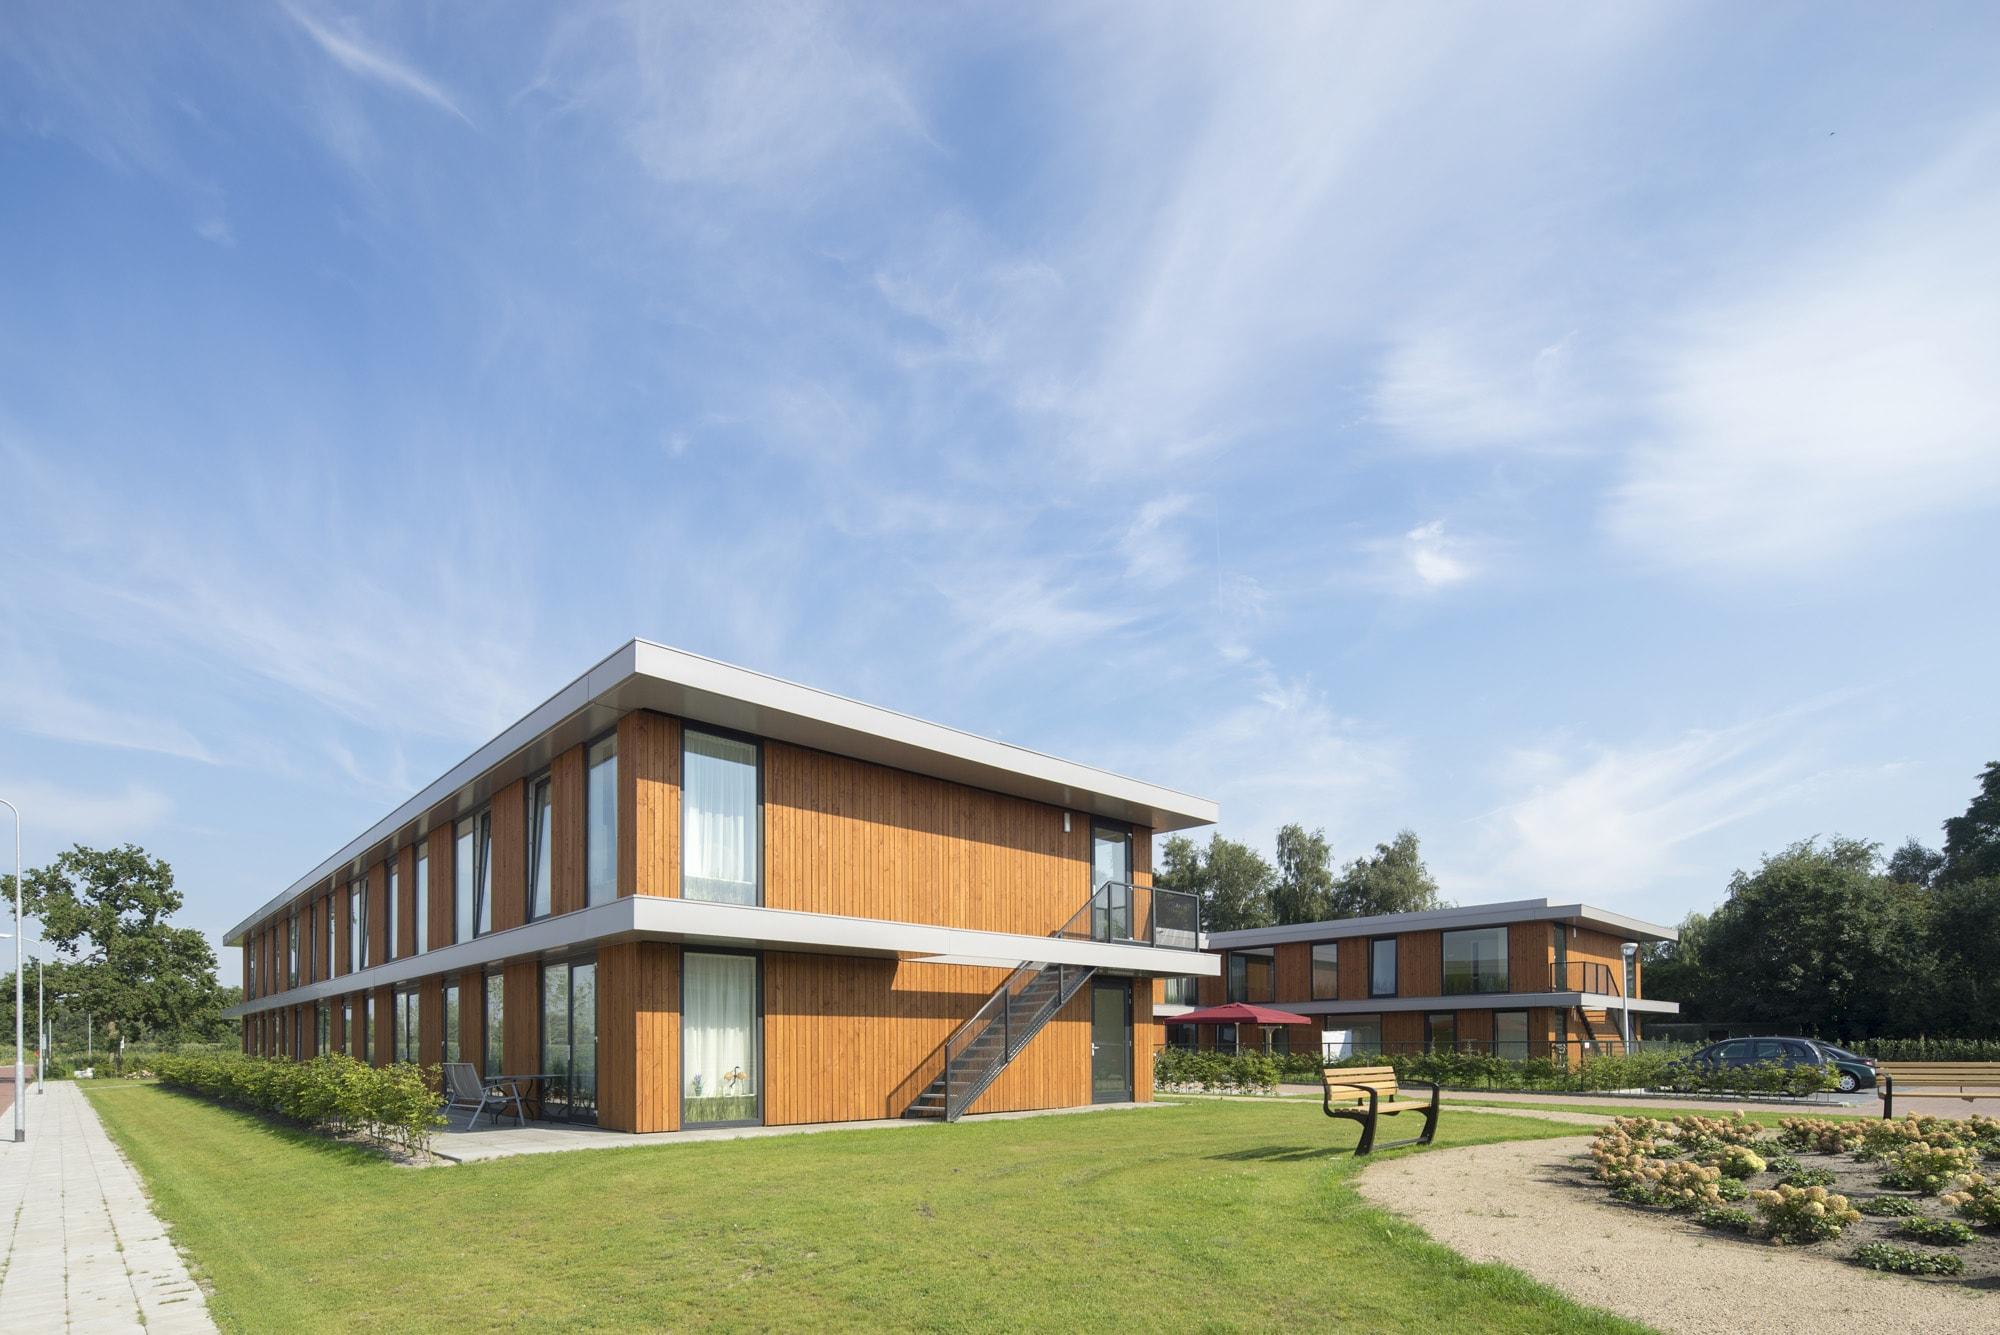 social housing project Kootwijkerbroek JMW architects